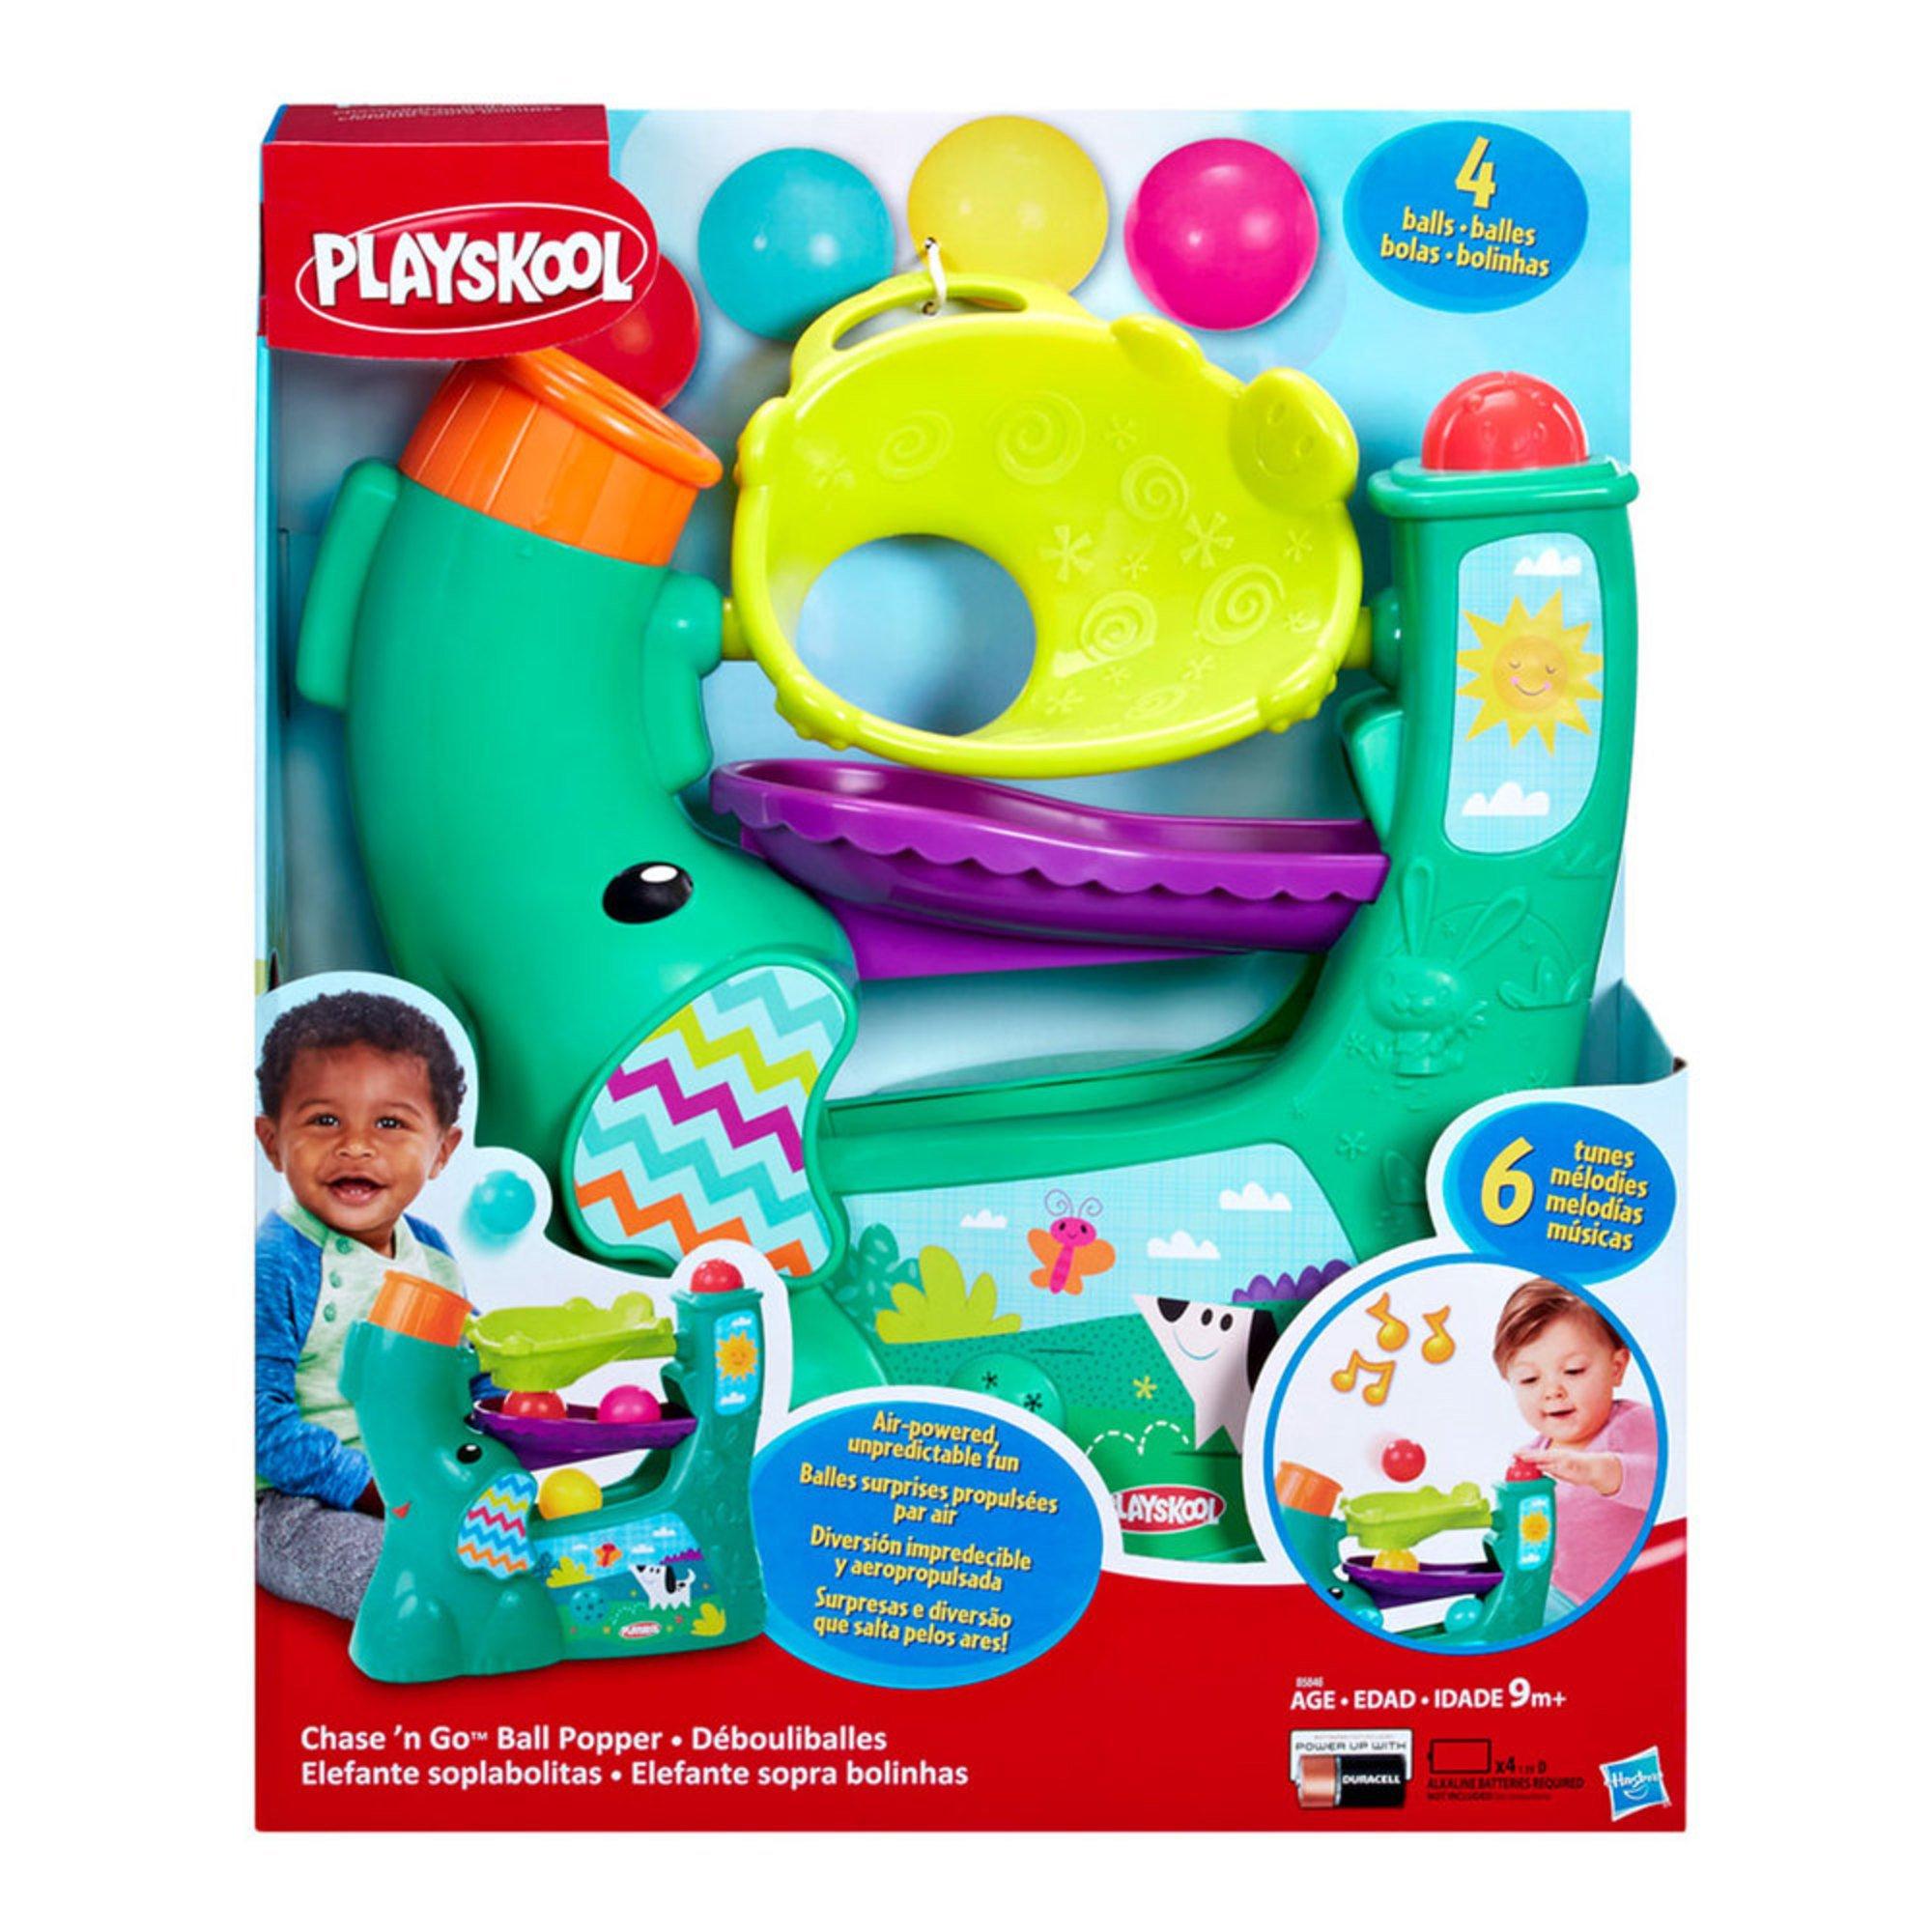 Best Ball Popper Toys For Kids : Playskool chase n go ball popper early learning toys